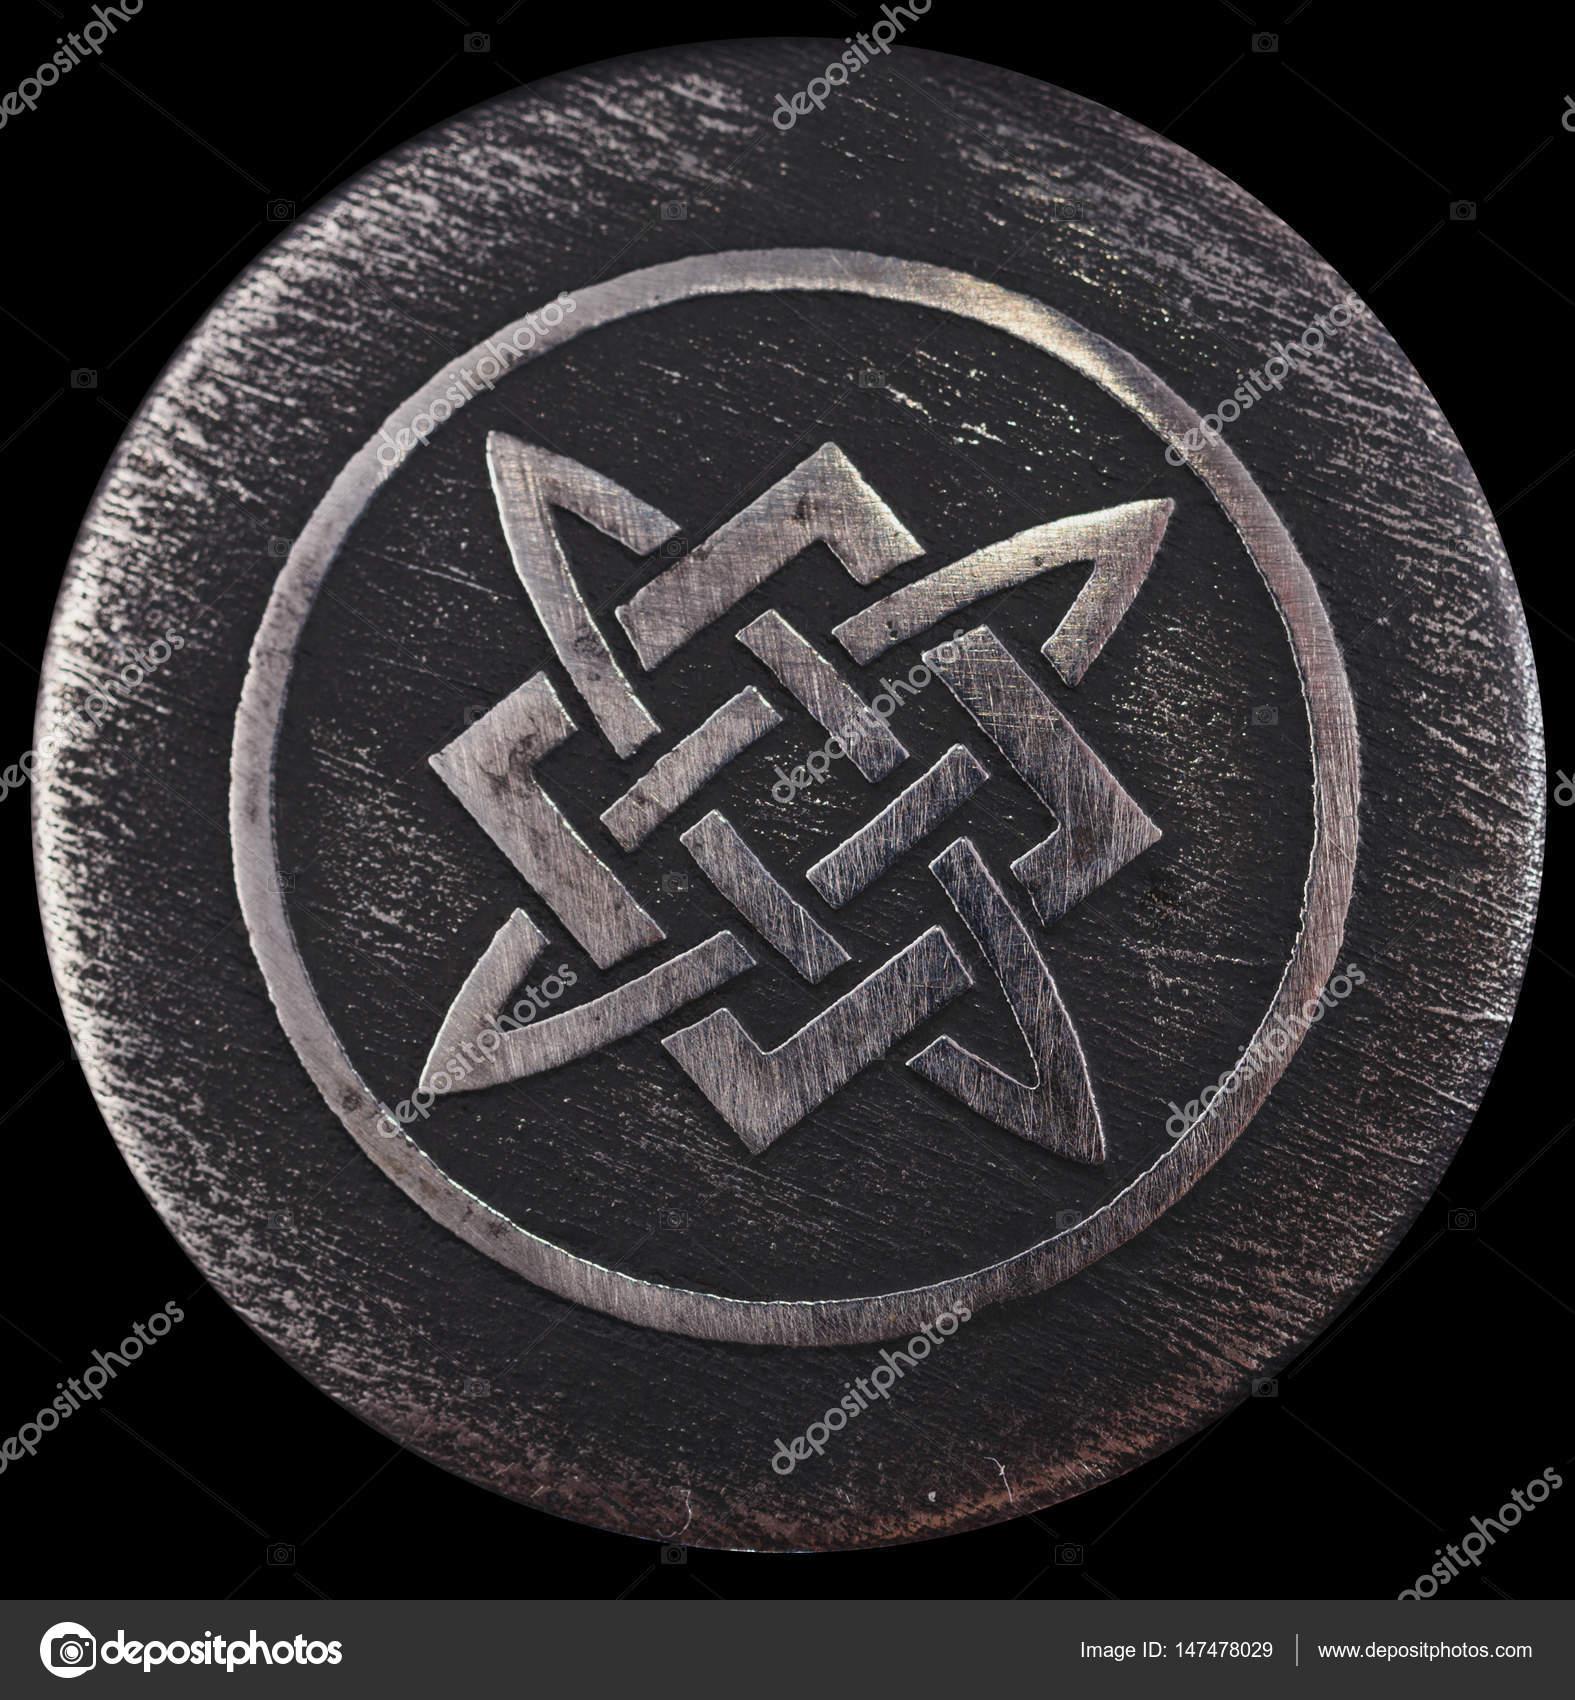 Alatyr-stone in Slavic mythology 58